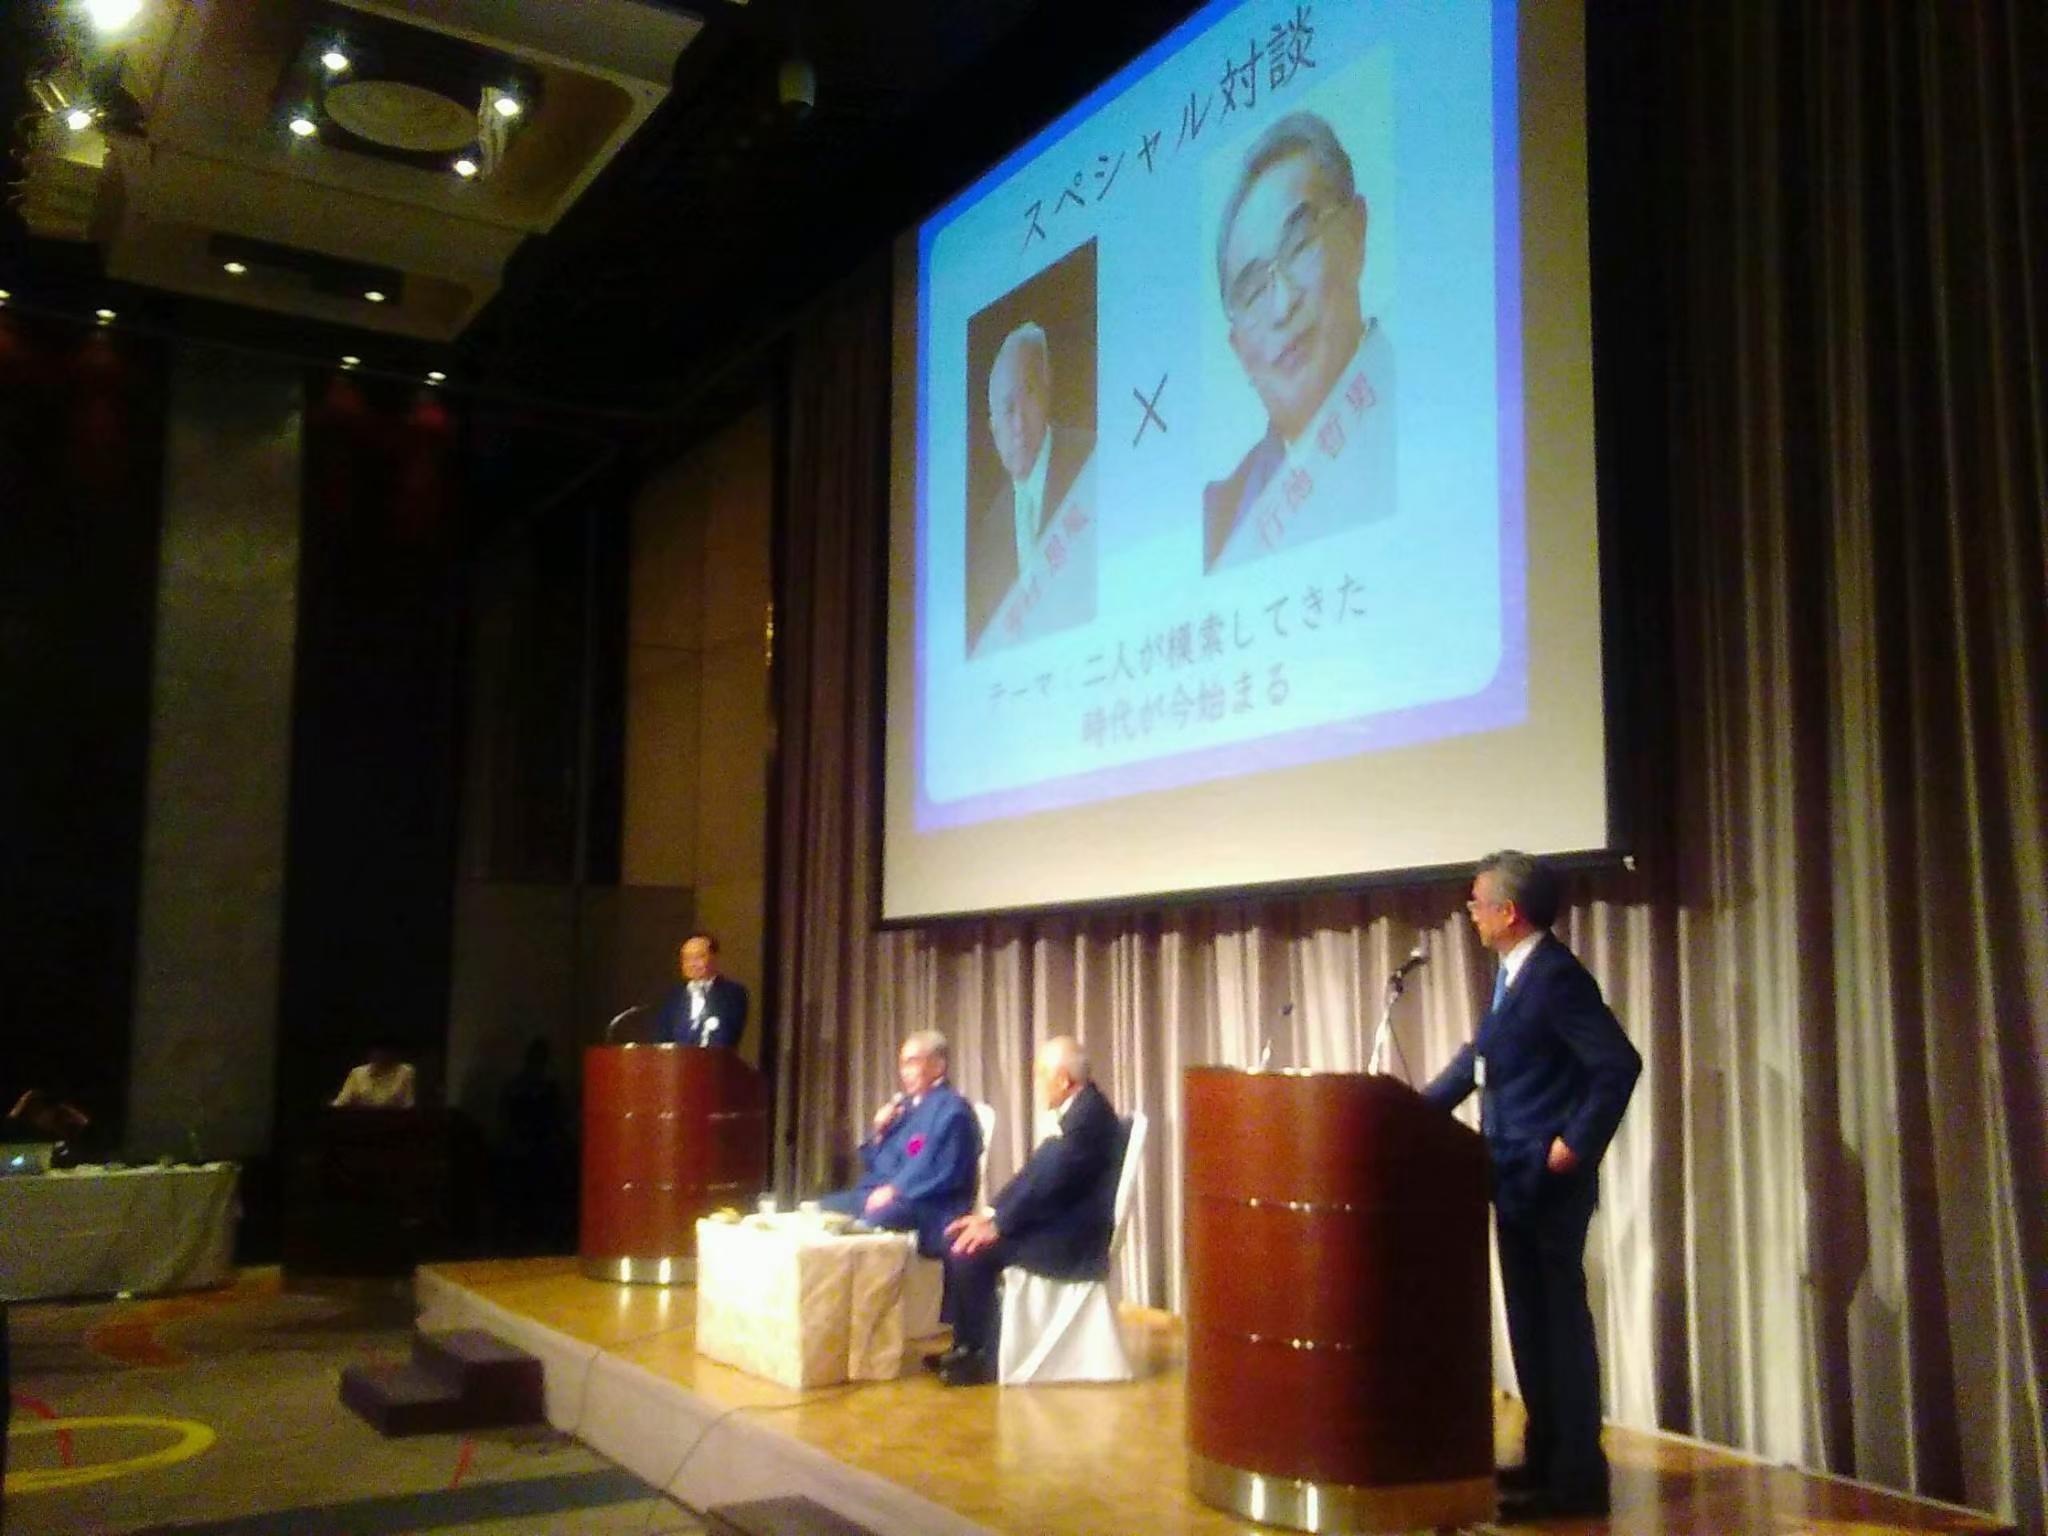 shifukaizenkoku 210602 0 - 思風会 ZOOM全国大会